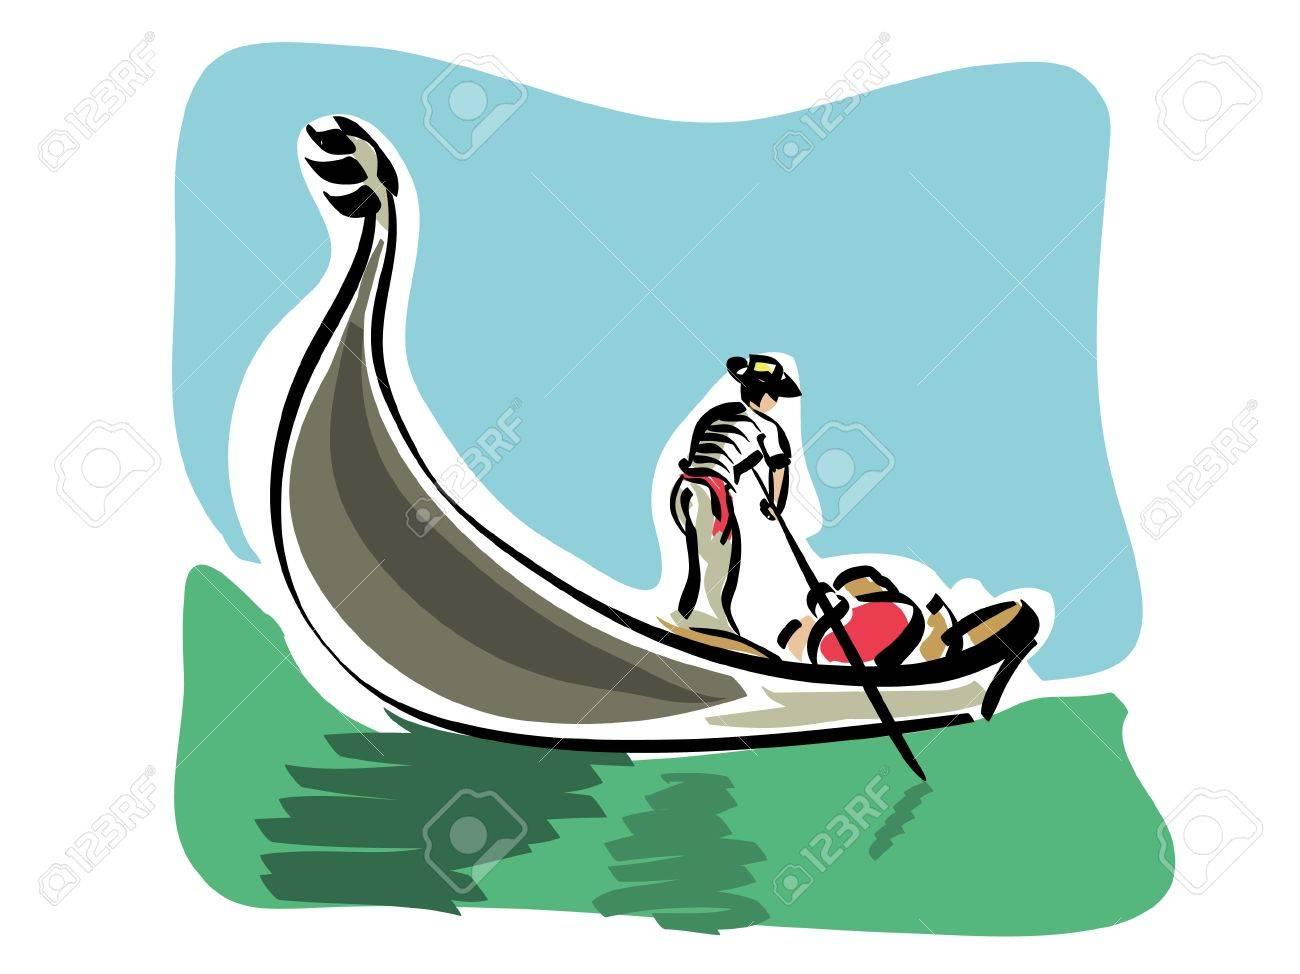 1300x974 Gondola Clipart Cartoon